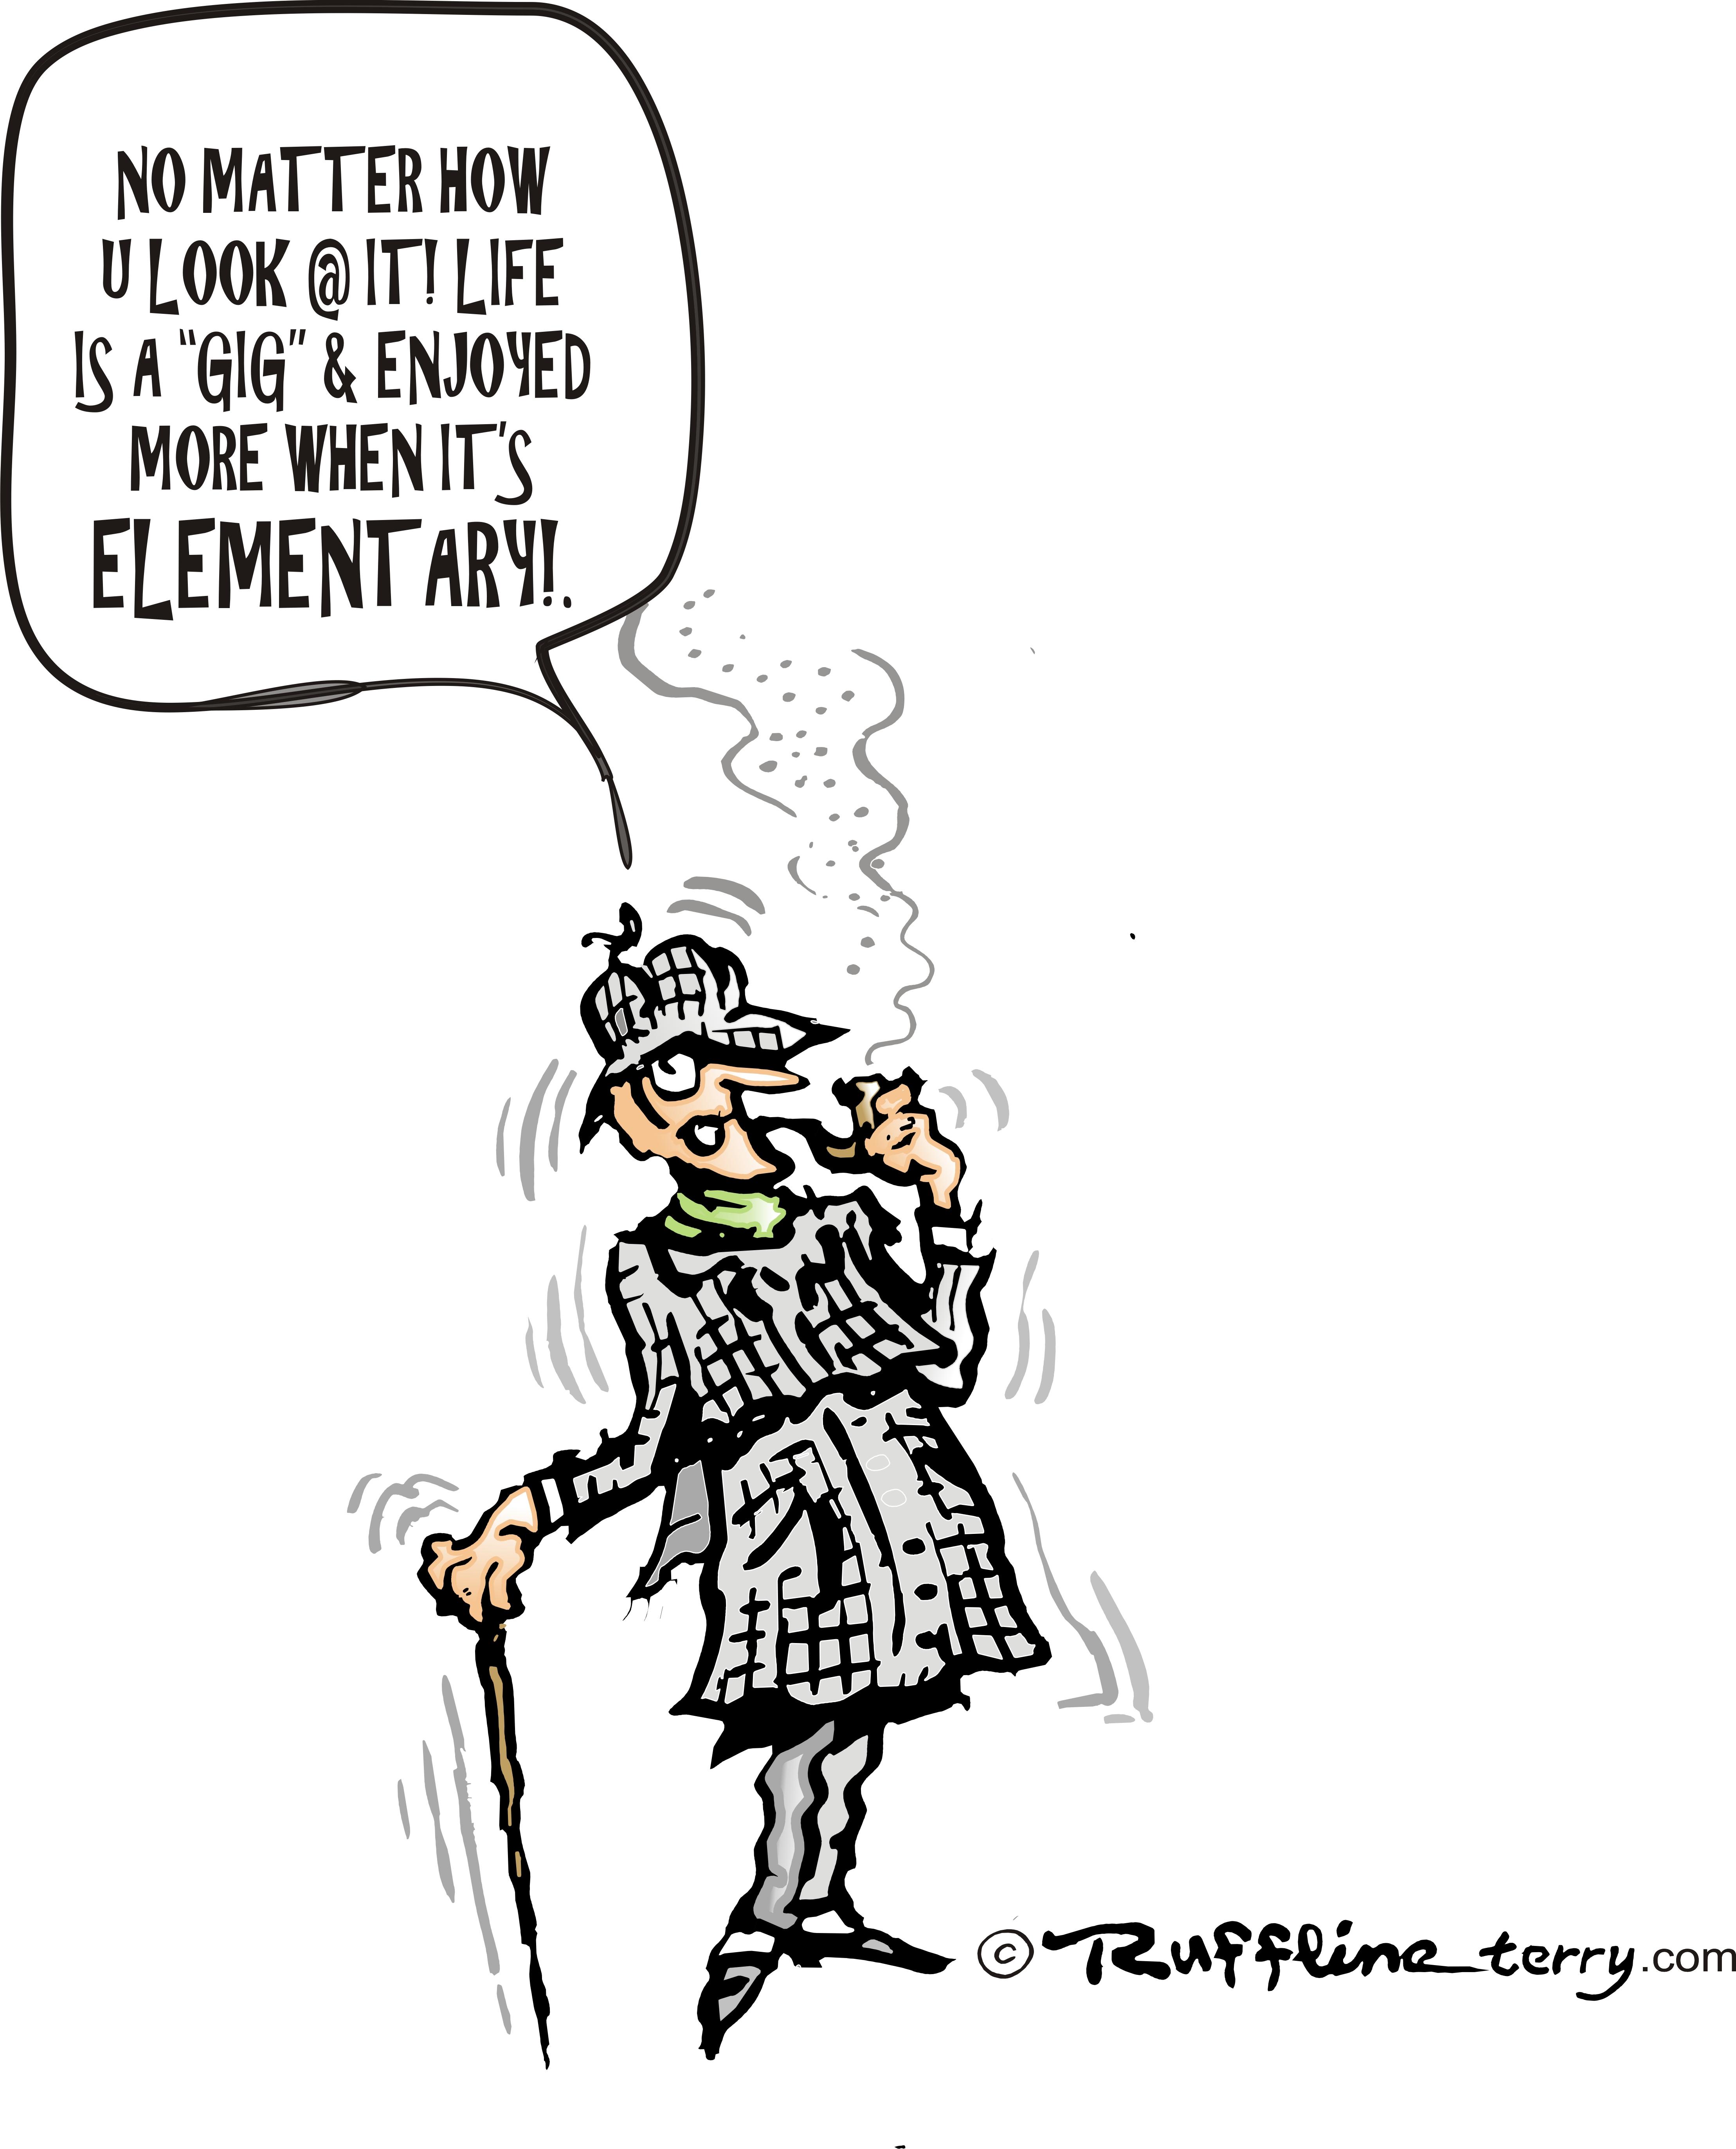 Arti My Dear : ELEMENTARY, WATSON, Ruffline's, Cartoon